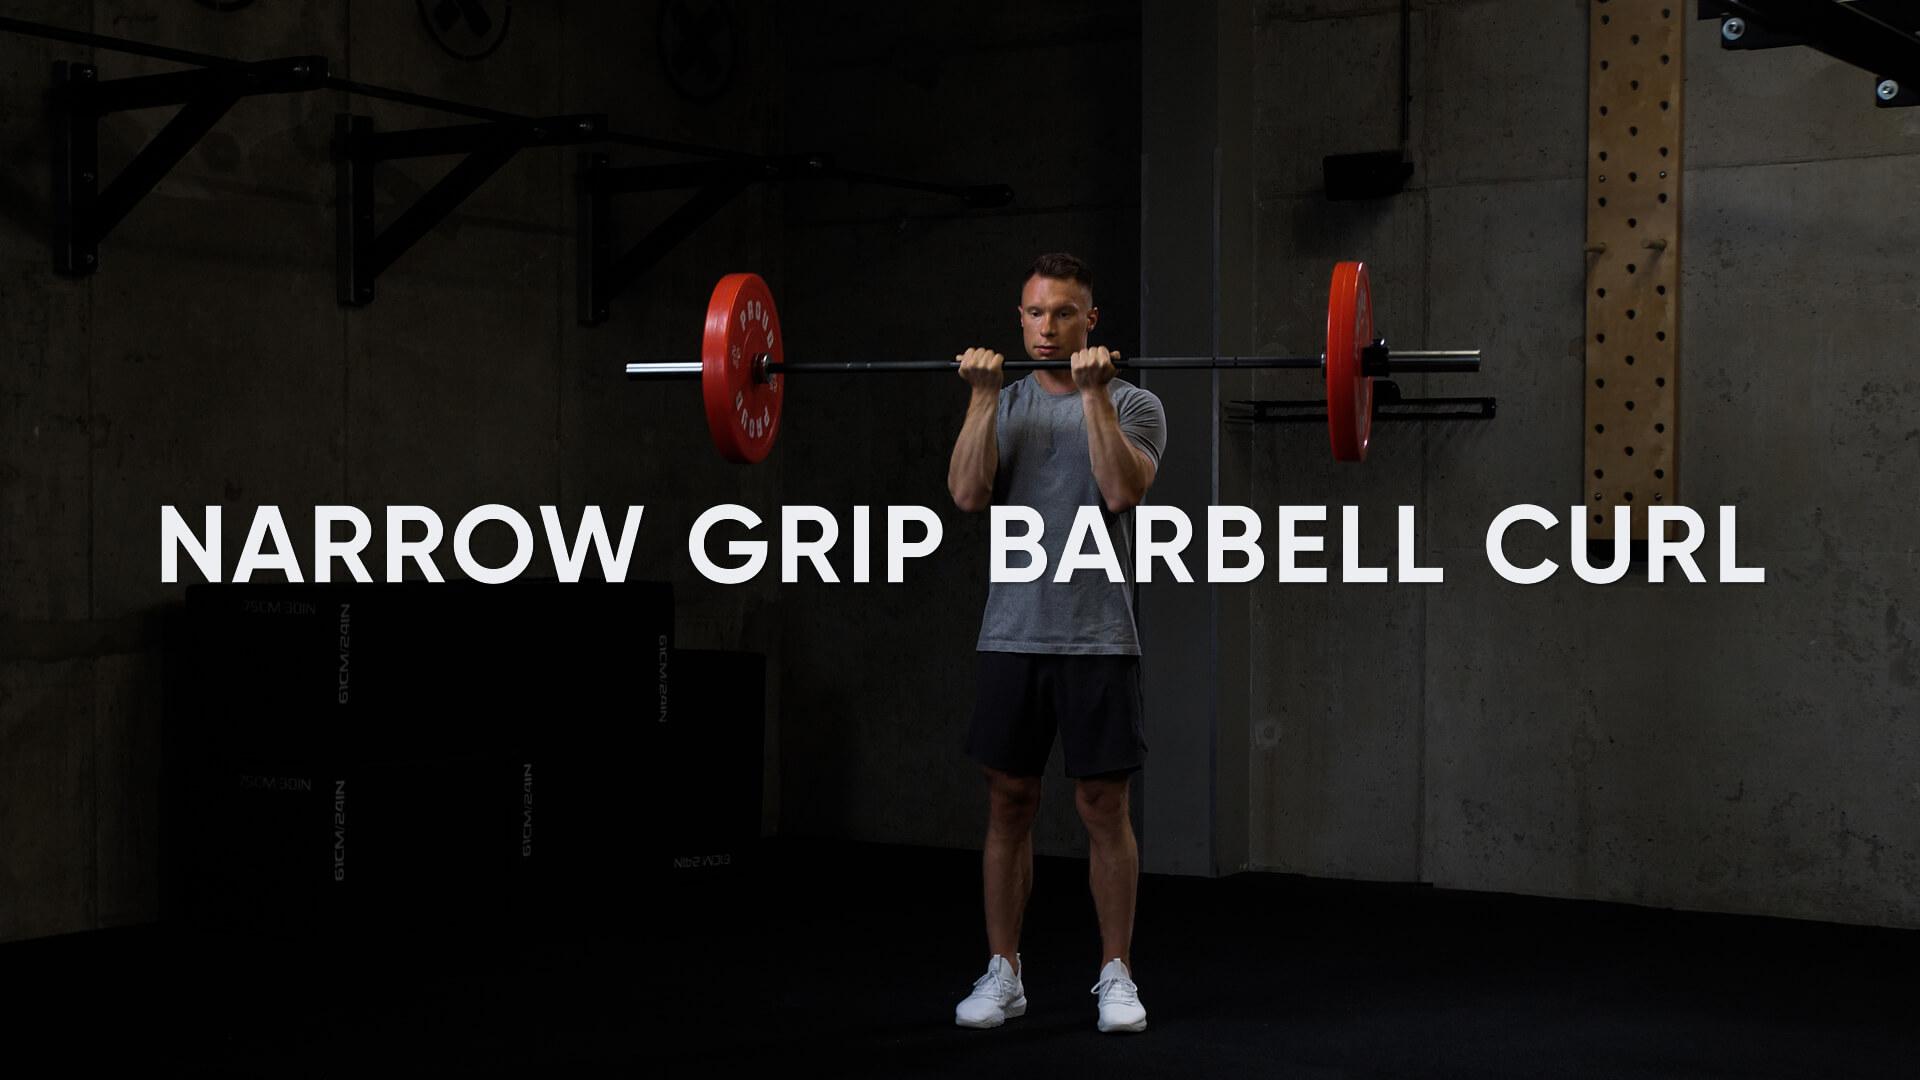 Narrow Grip Barbell Curl